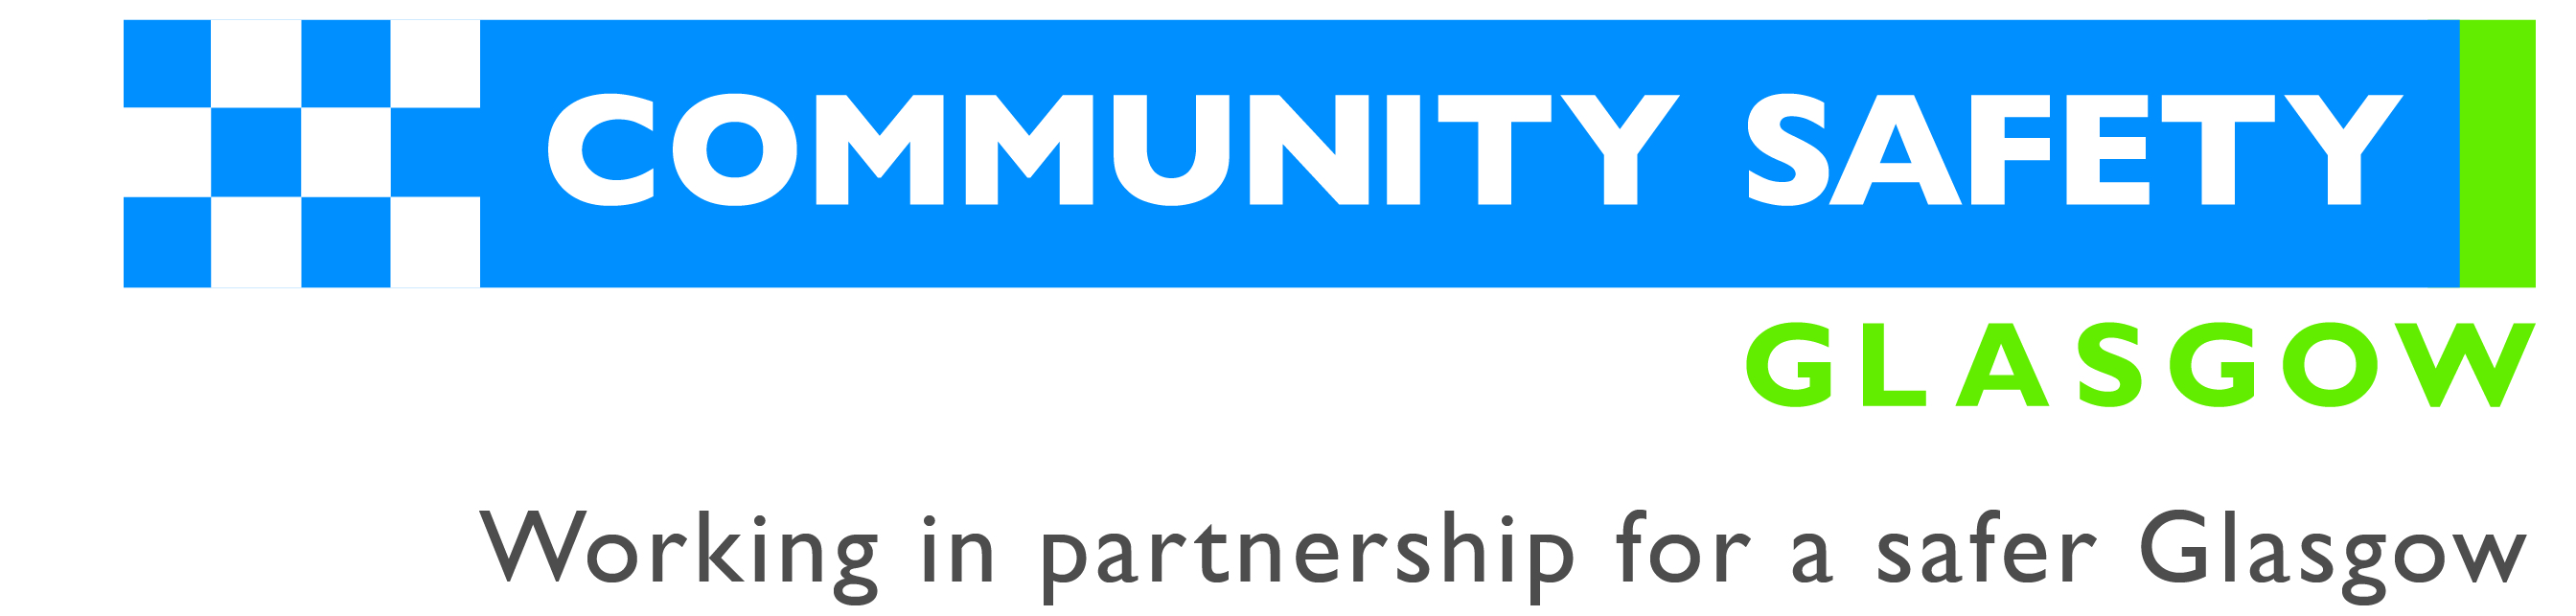 CSG - Logo Final with strapline